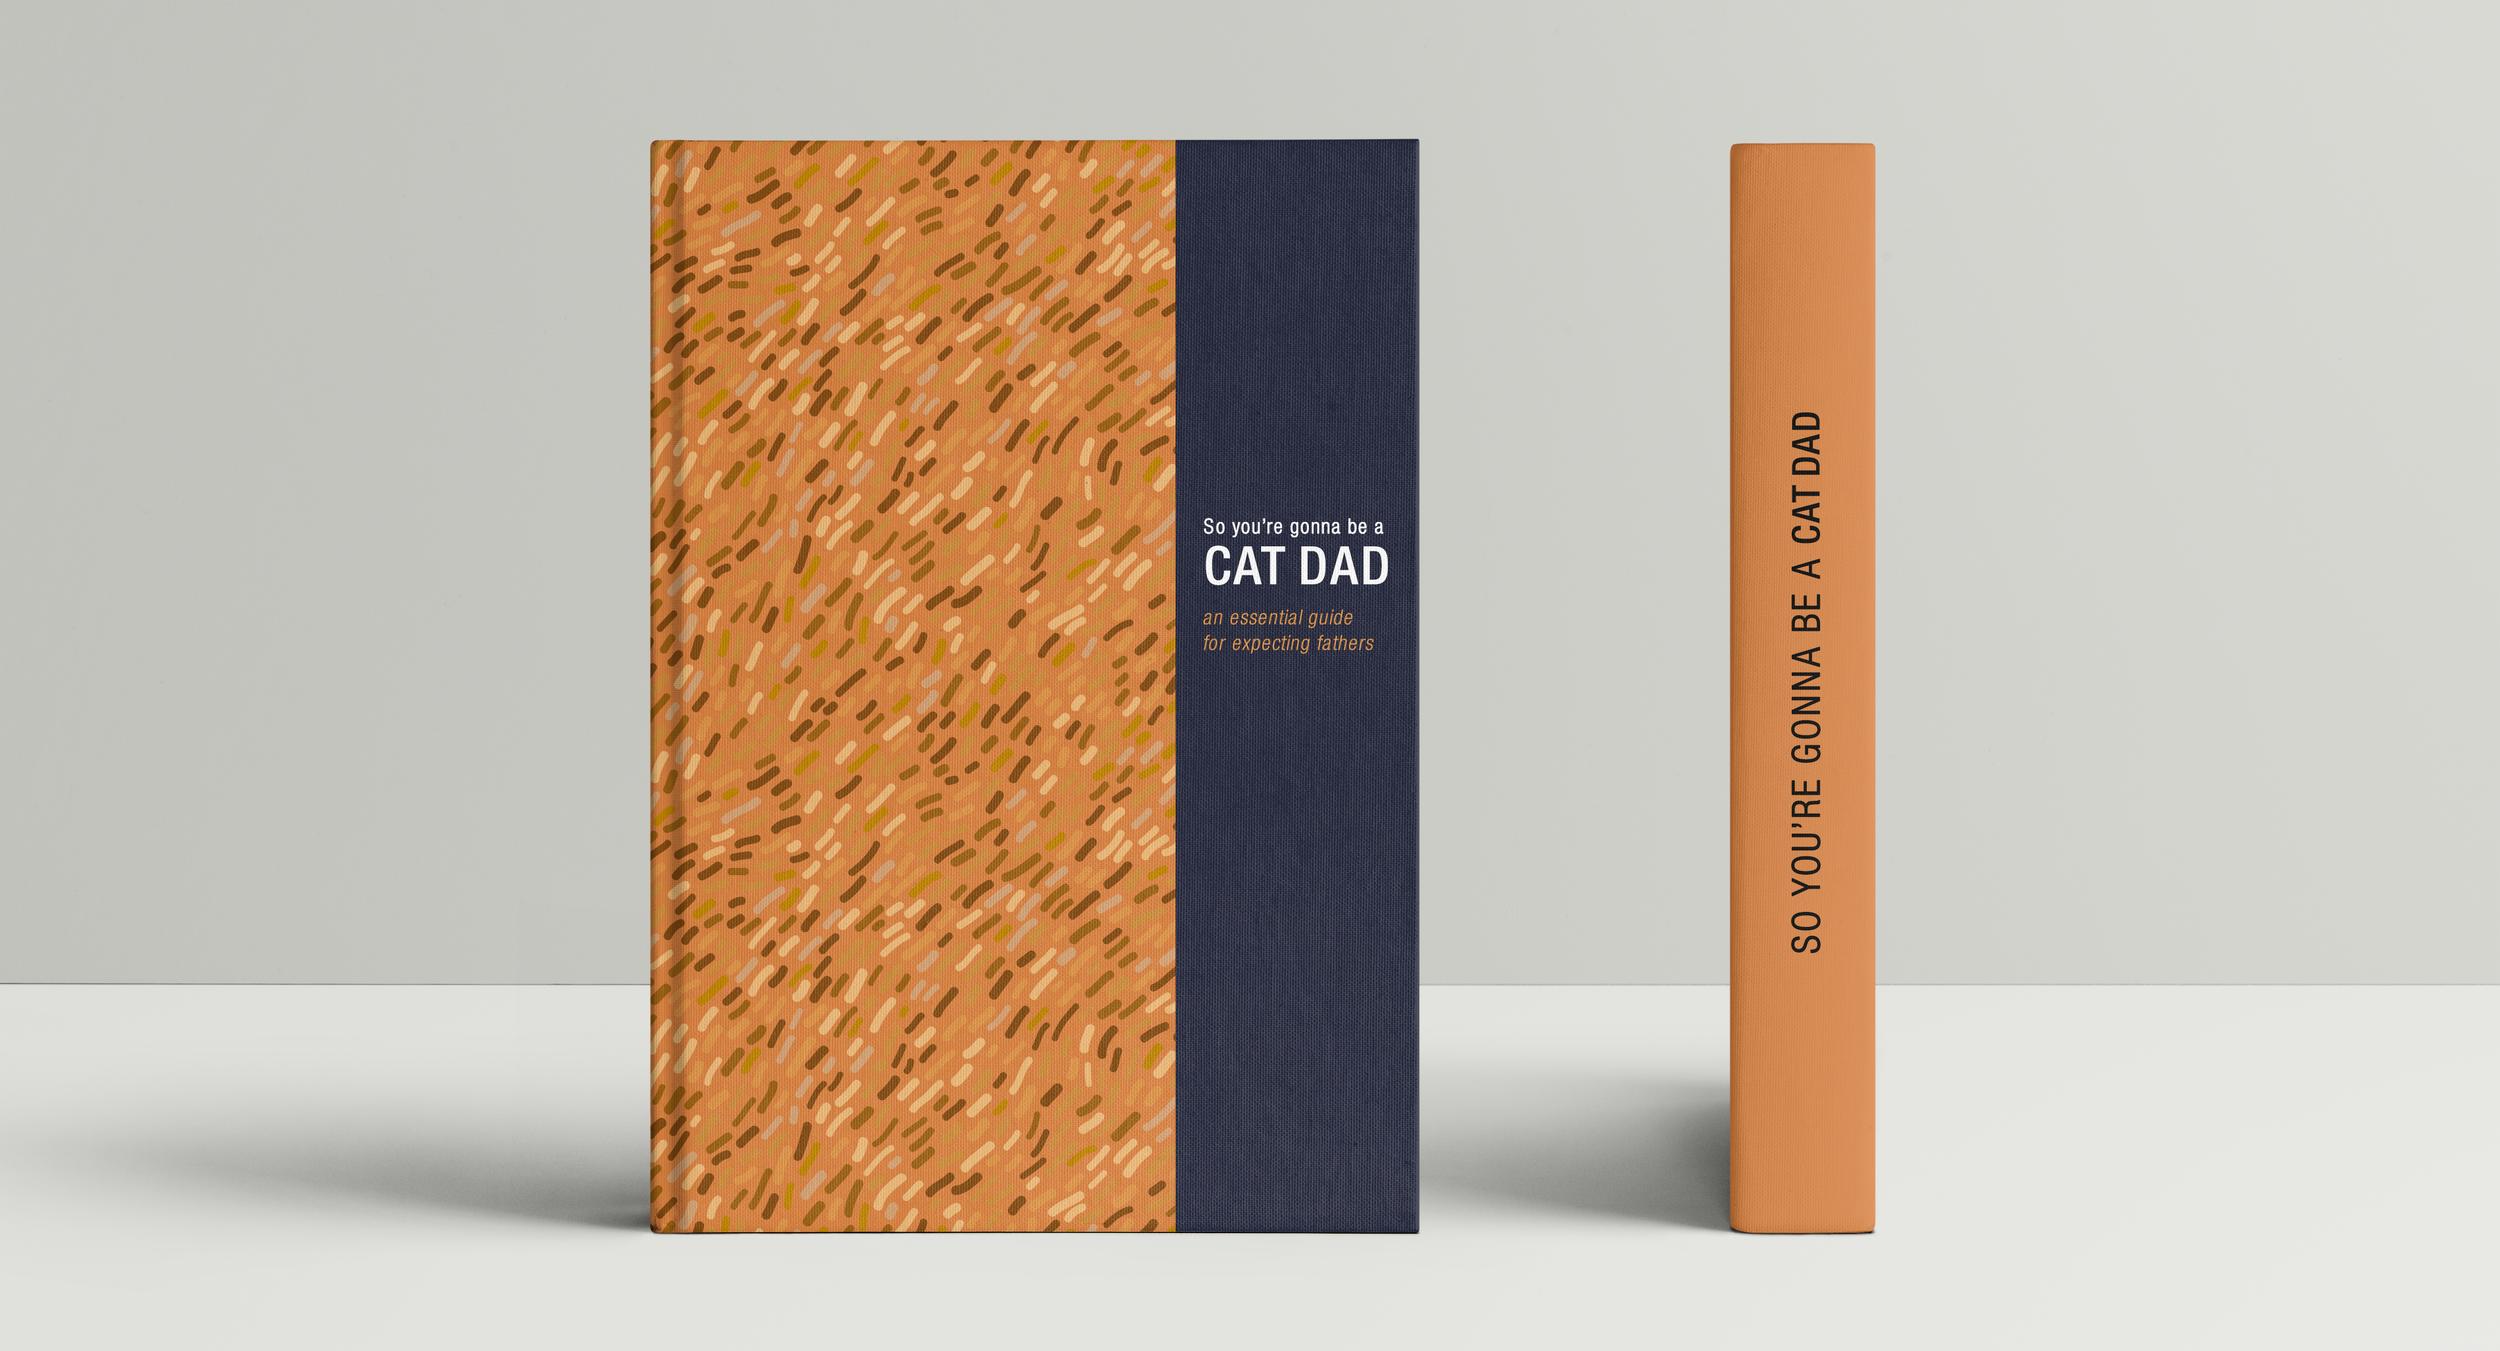 CatDad_Cover_Mockup4.png